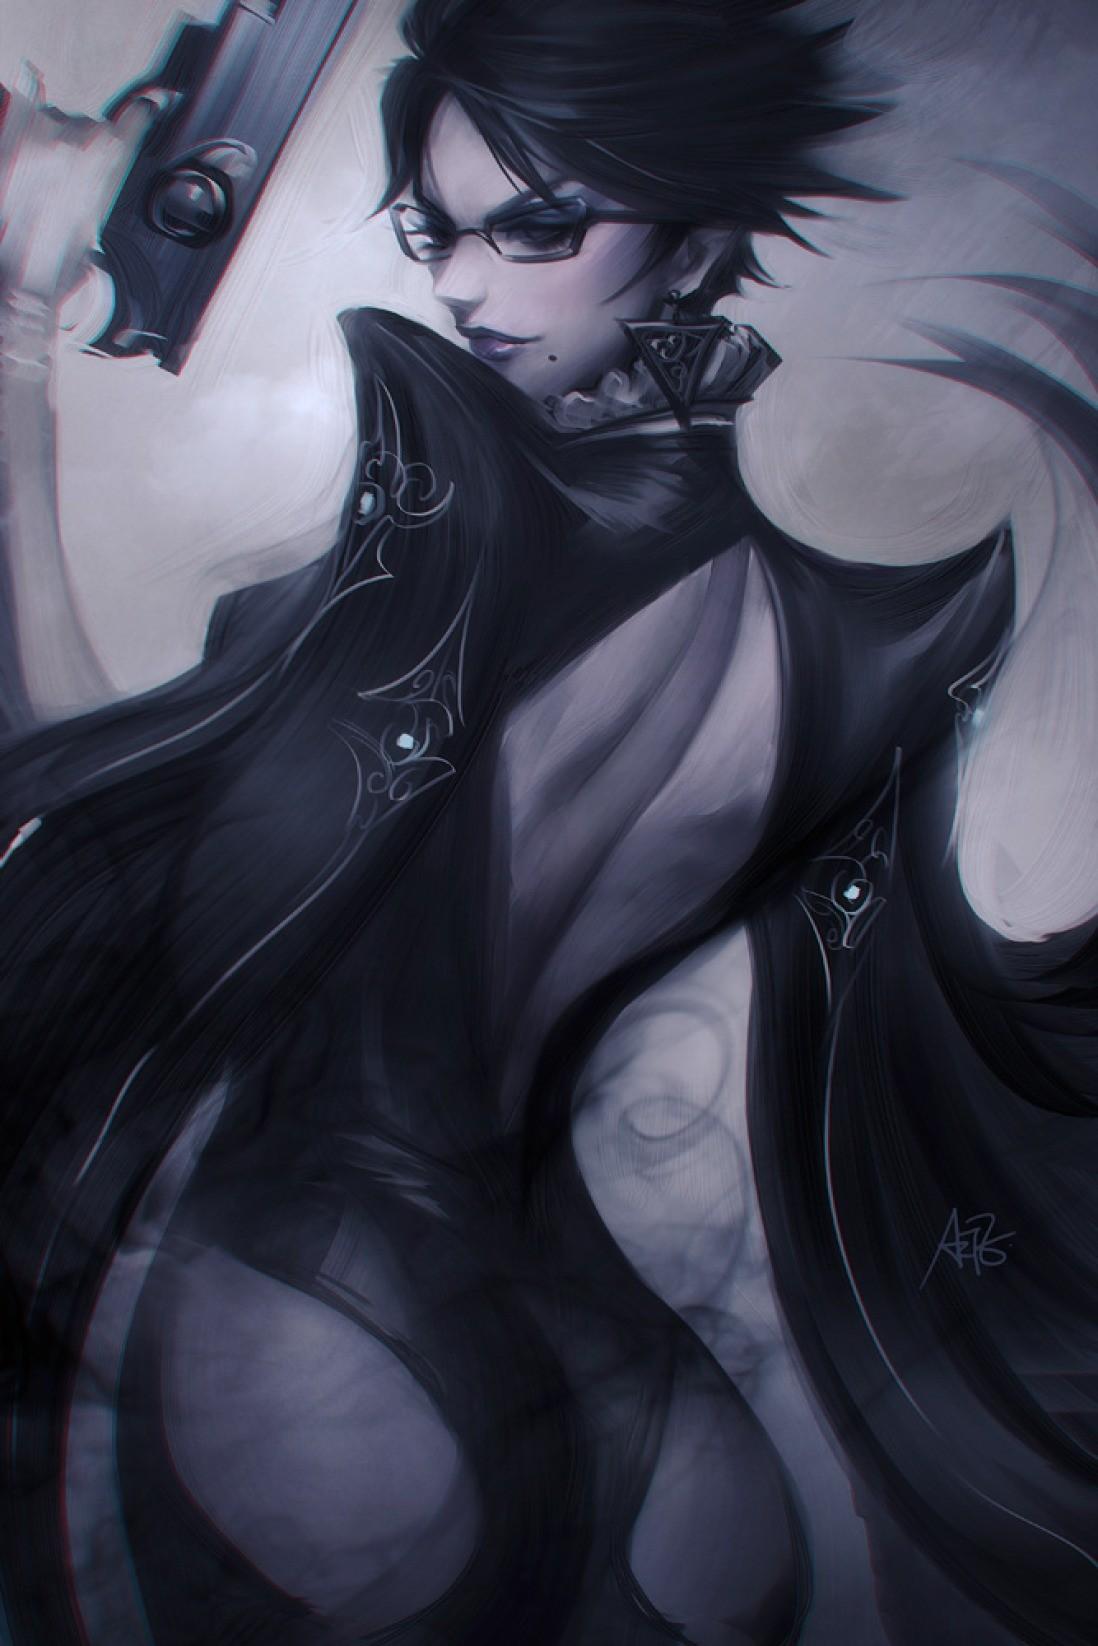 General 1098x1646 women ass gun weapon glasses fantasy girl fantasy art Jeanne (Bayonetta)